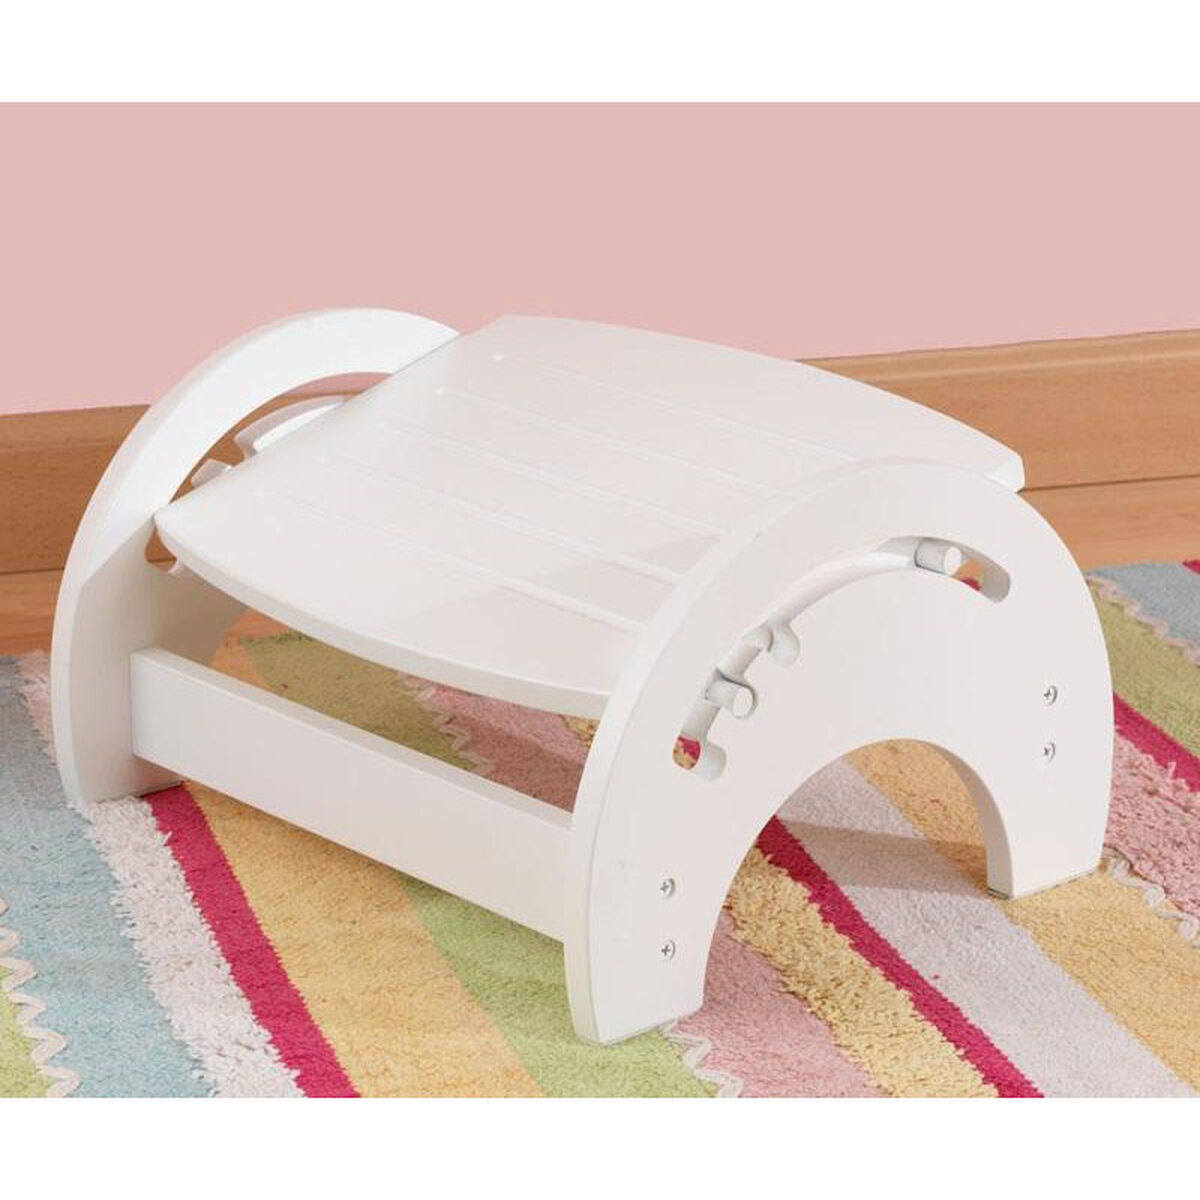 KidKraft Wooden Adjustable Stool for Nursing with Anti-slip Pads on the Base - White 15101 ...